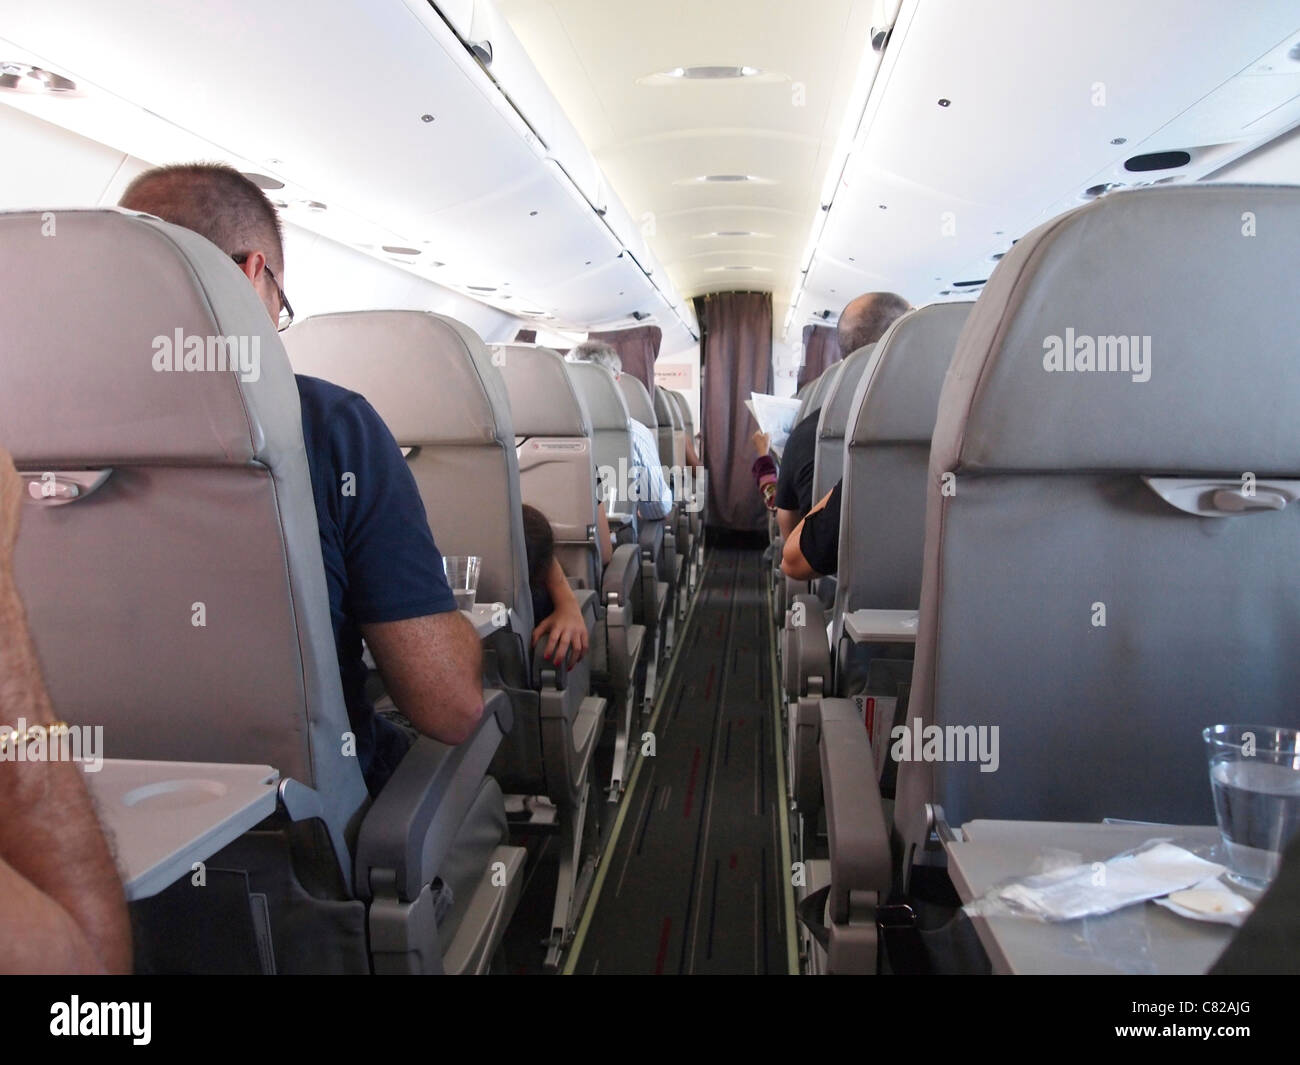 Aeroplane passengers on an airplane - Stock Image